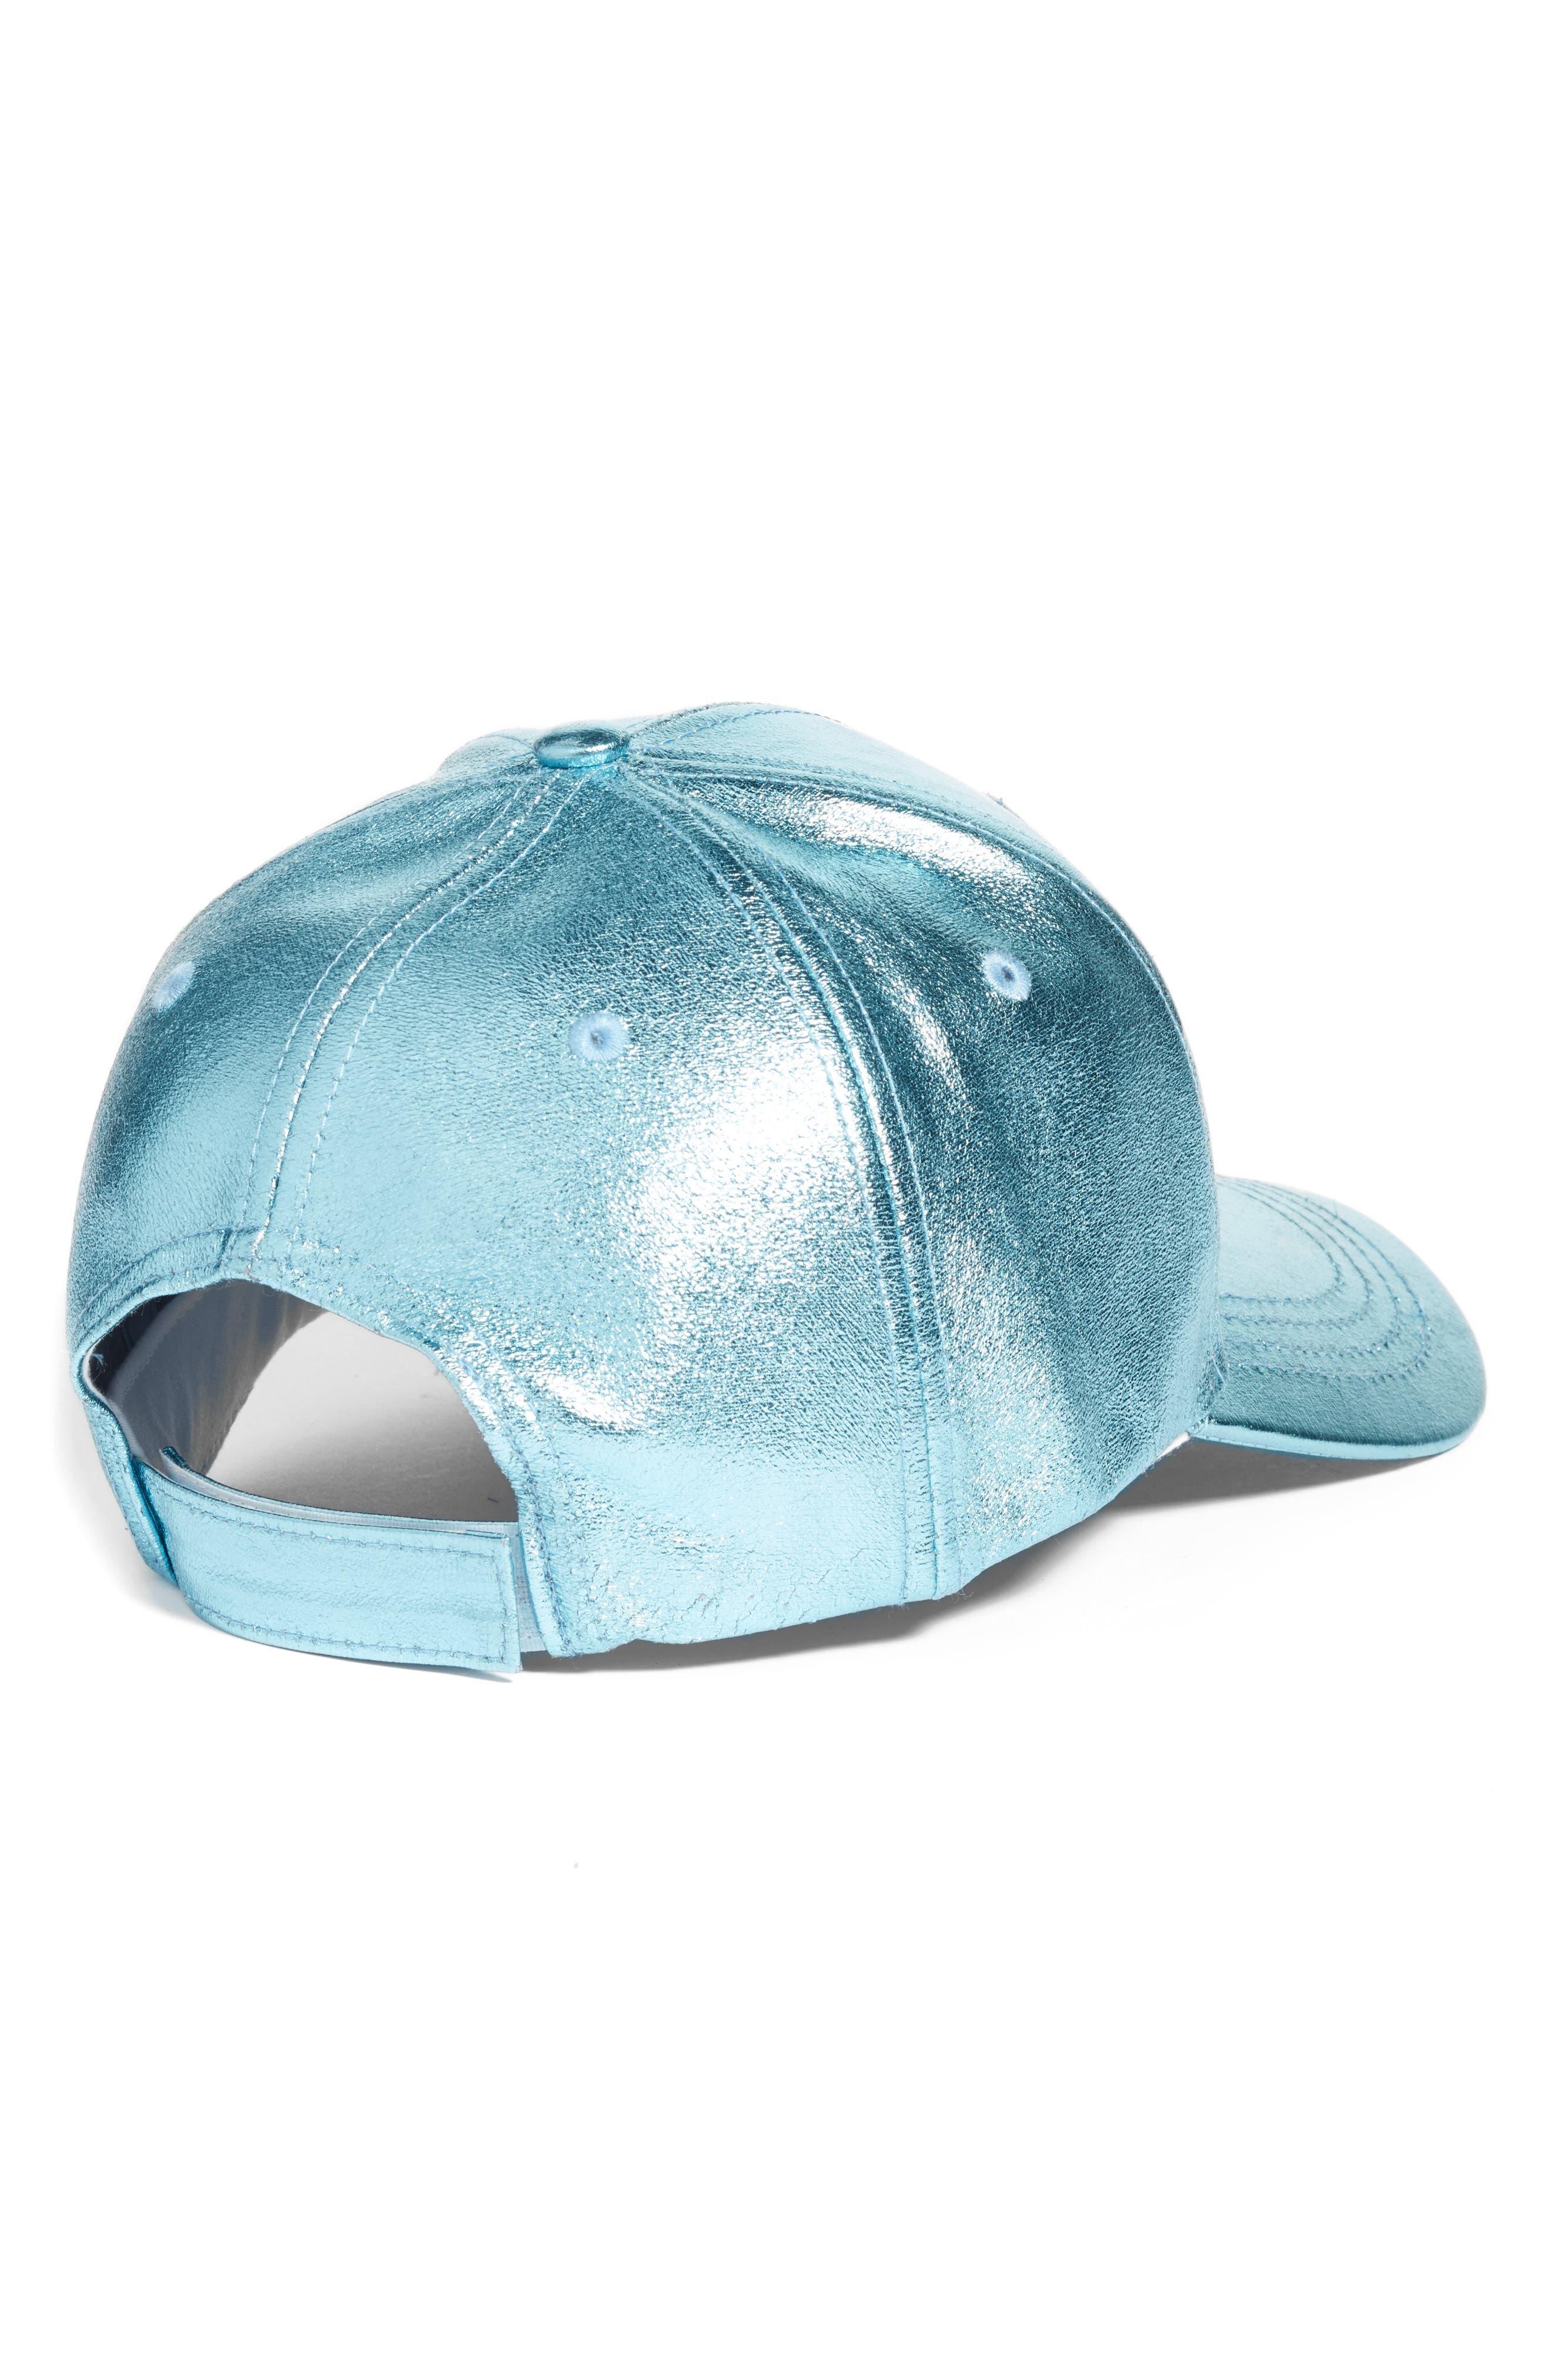 Crackled Metallic Baseball Cap,                             Alternate thumbnail 2, color,                             Blue